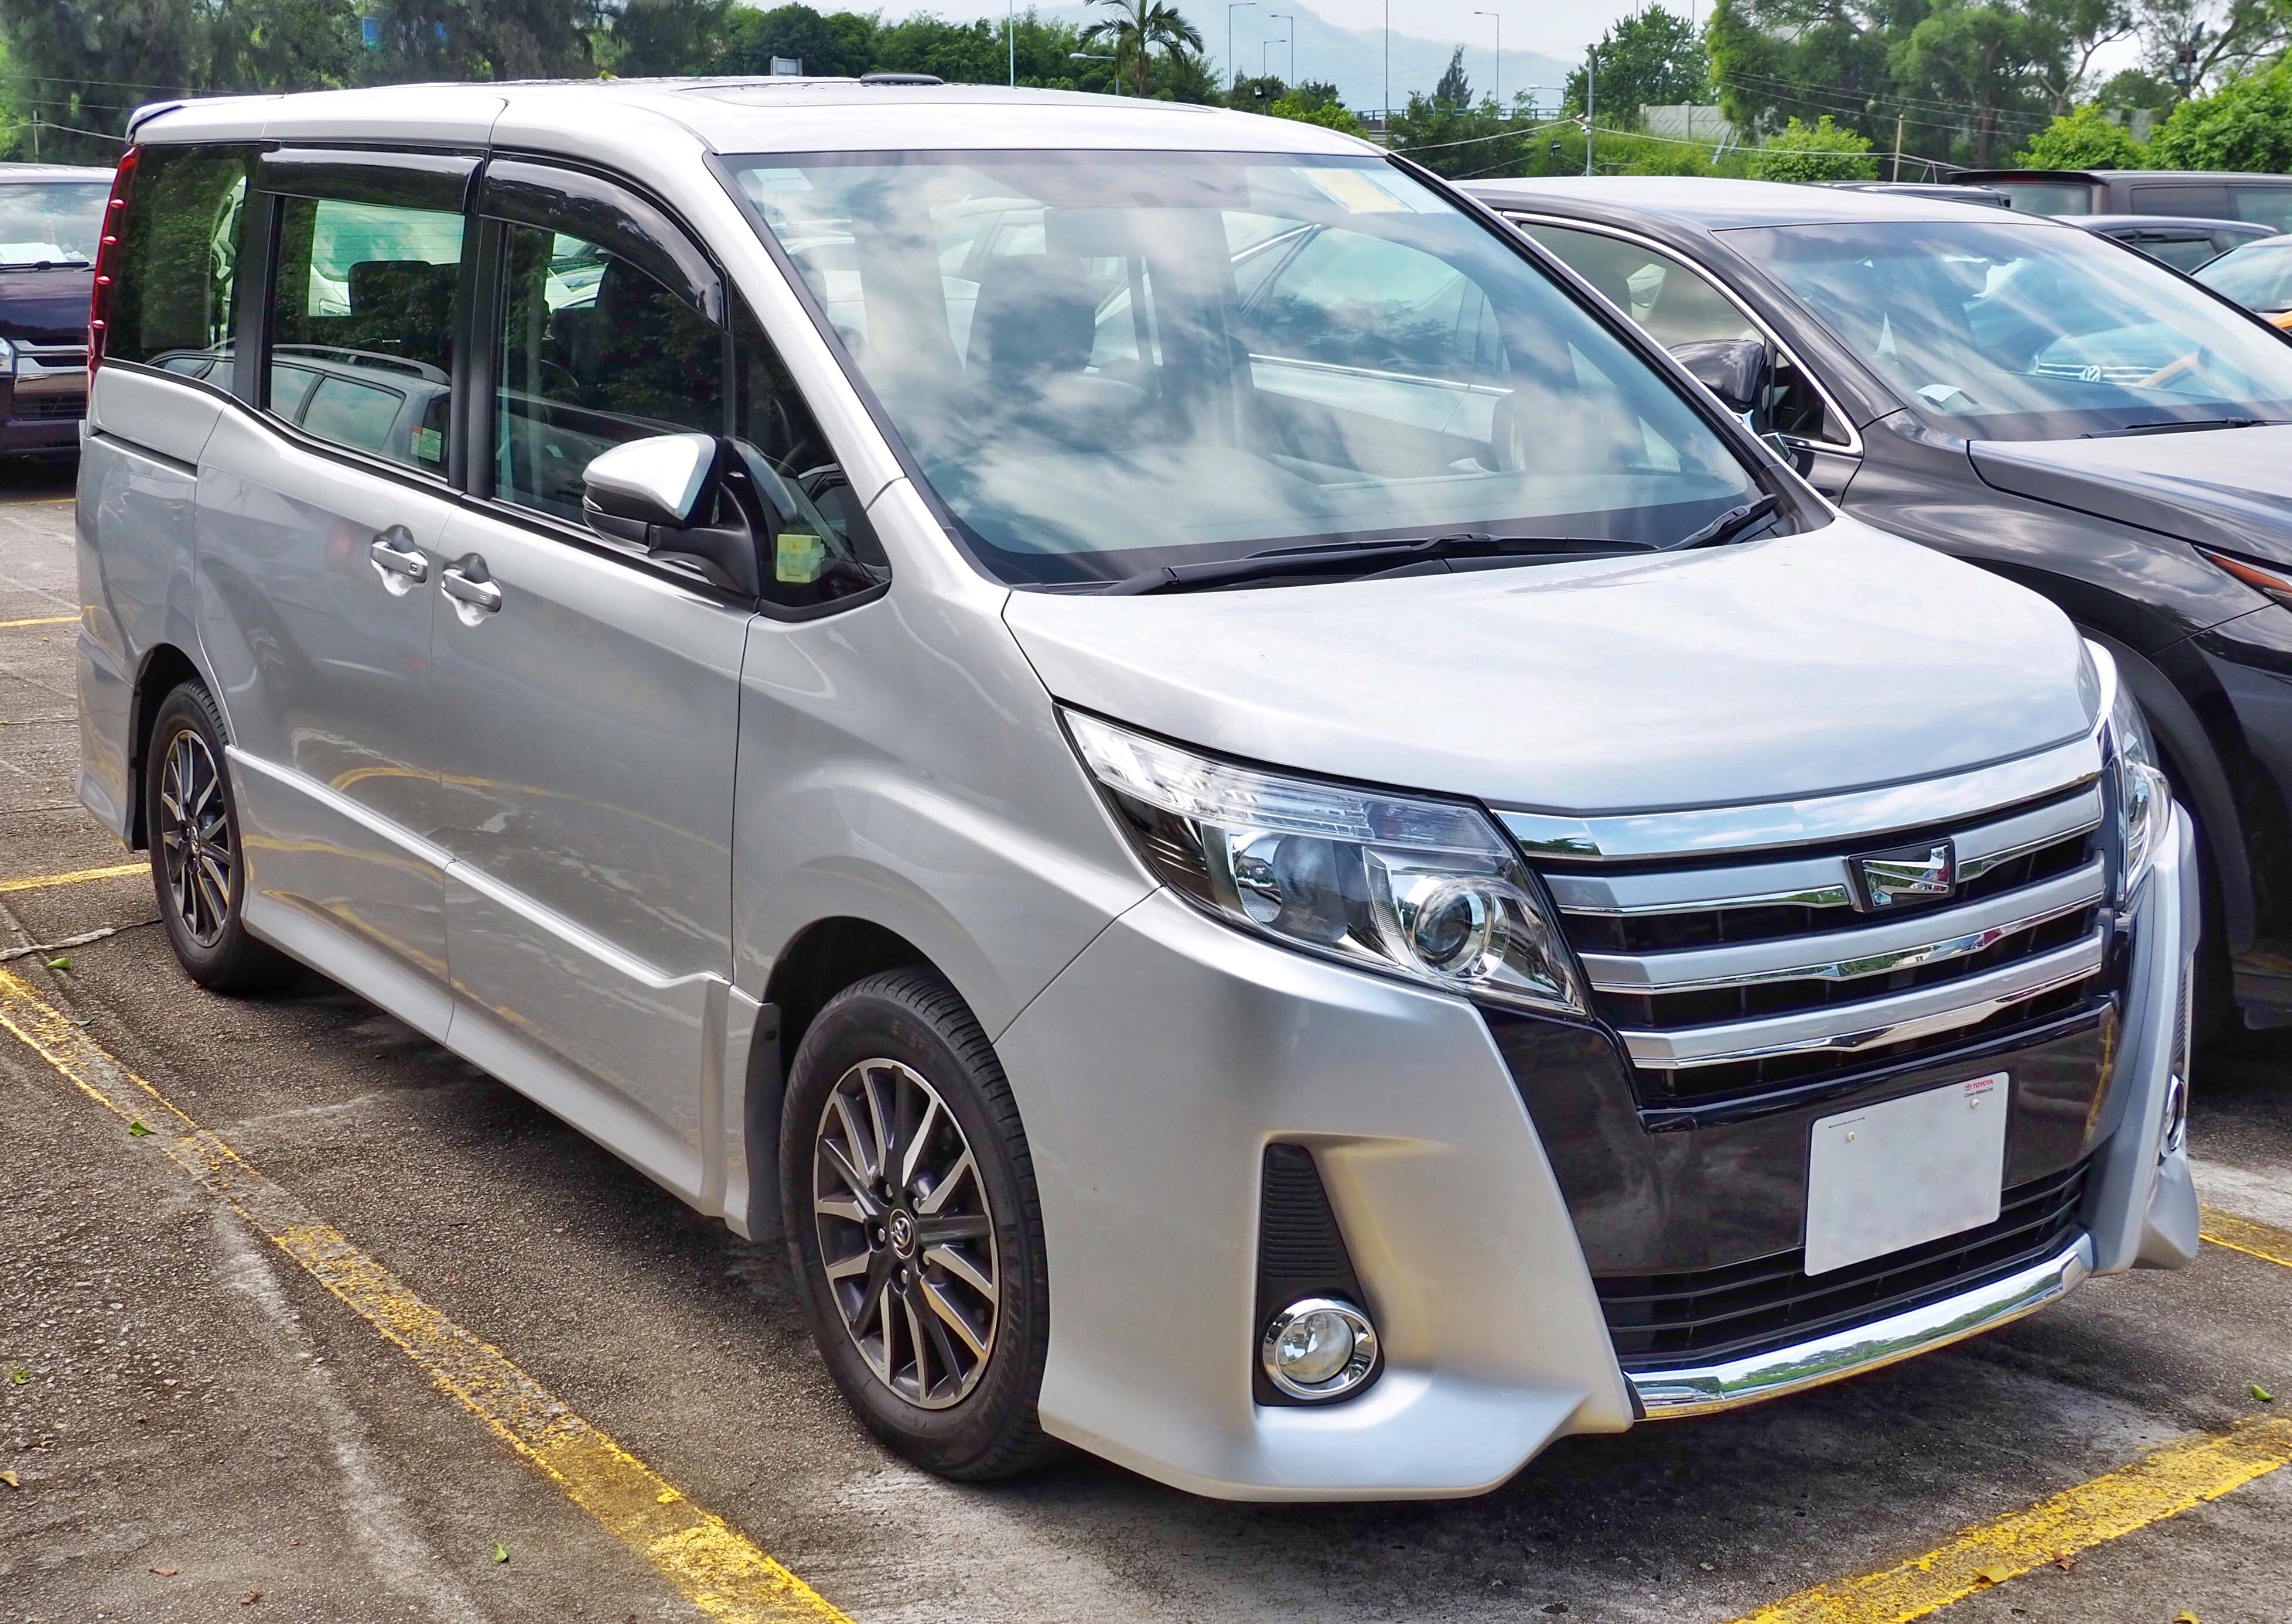 Berkas 2014 Toyota Noah Si Pre Facelift Jpg Wikipedia Bahasa Indonesia Ensiklopedia Bebas